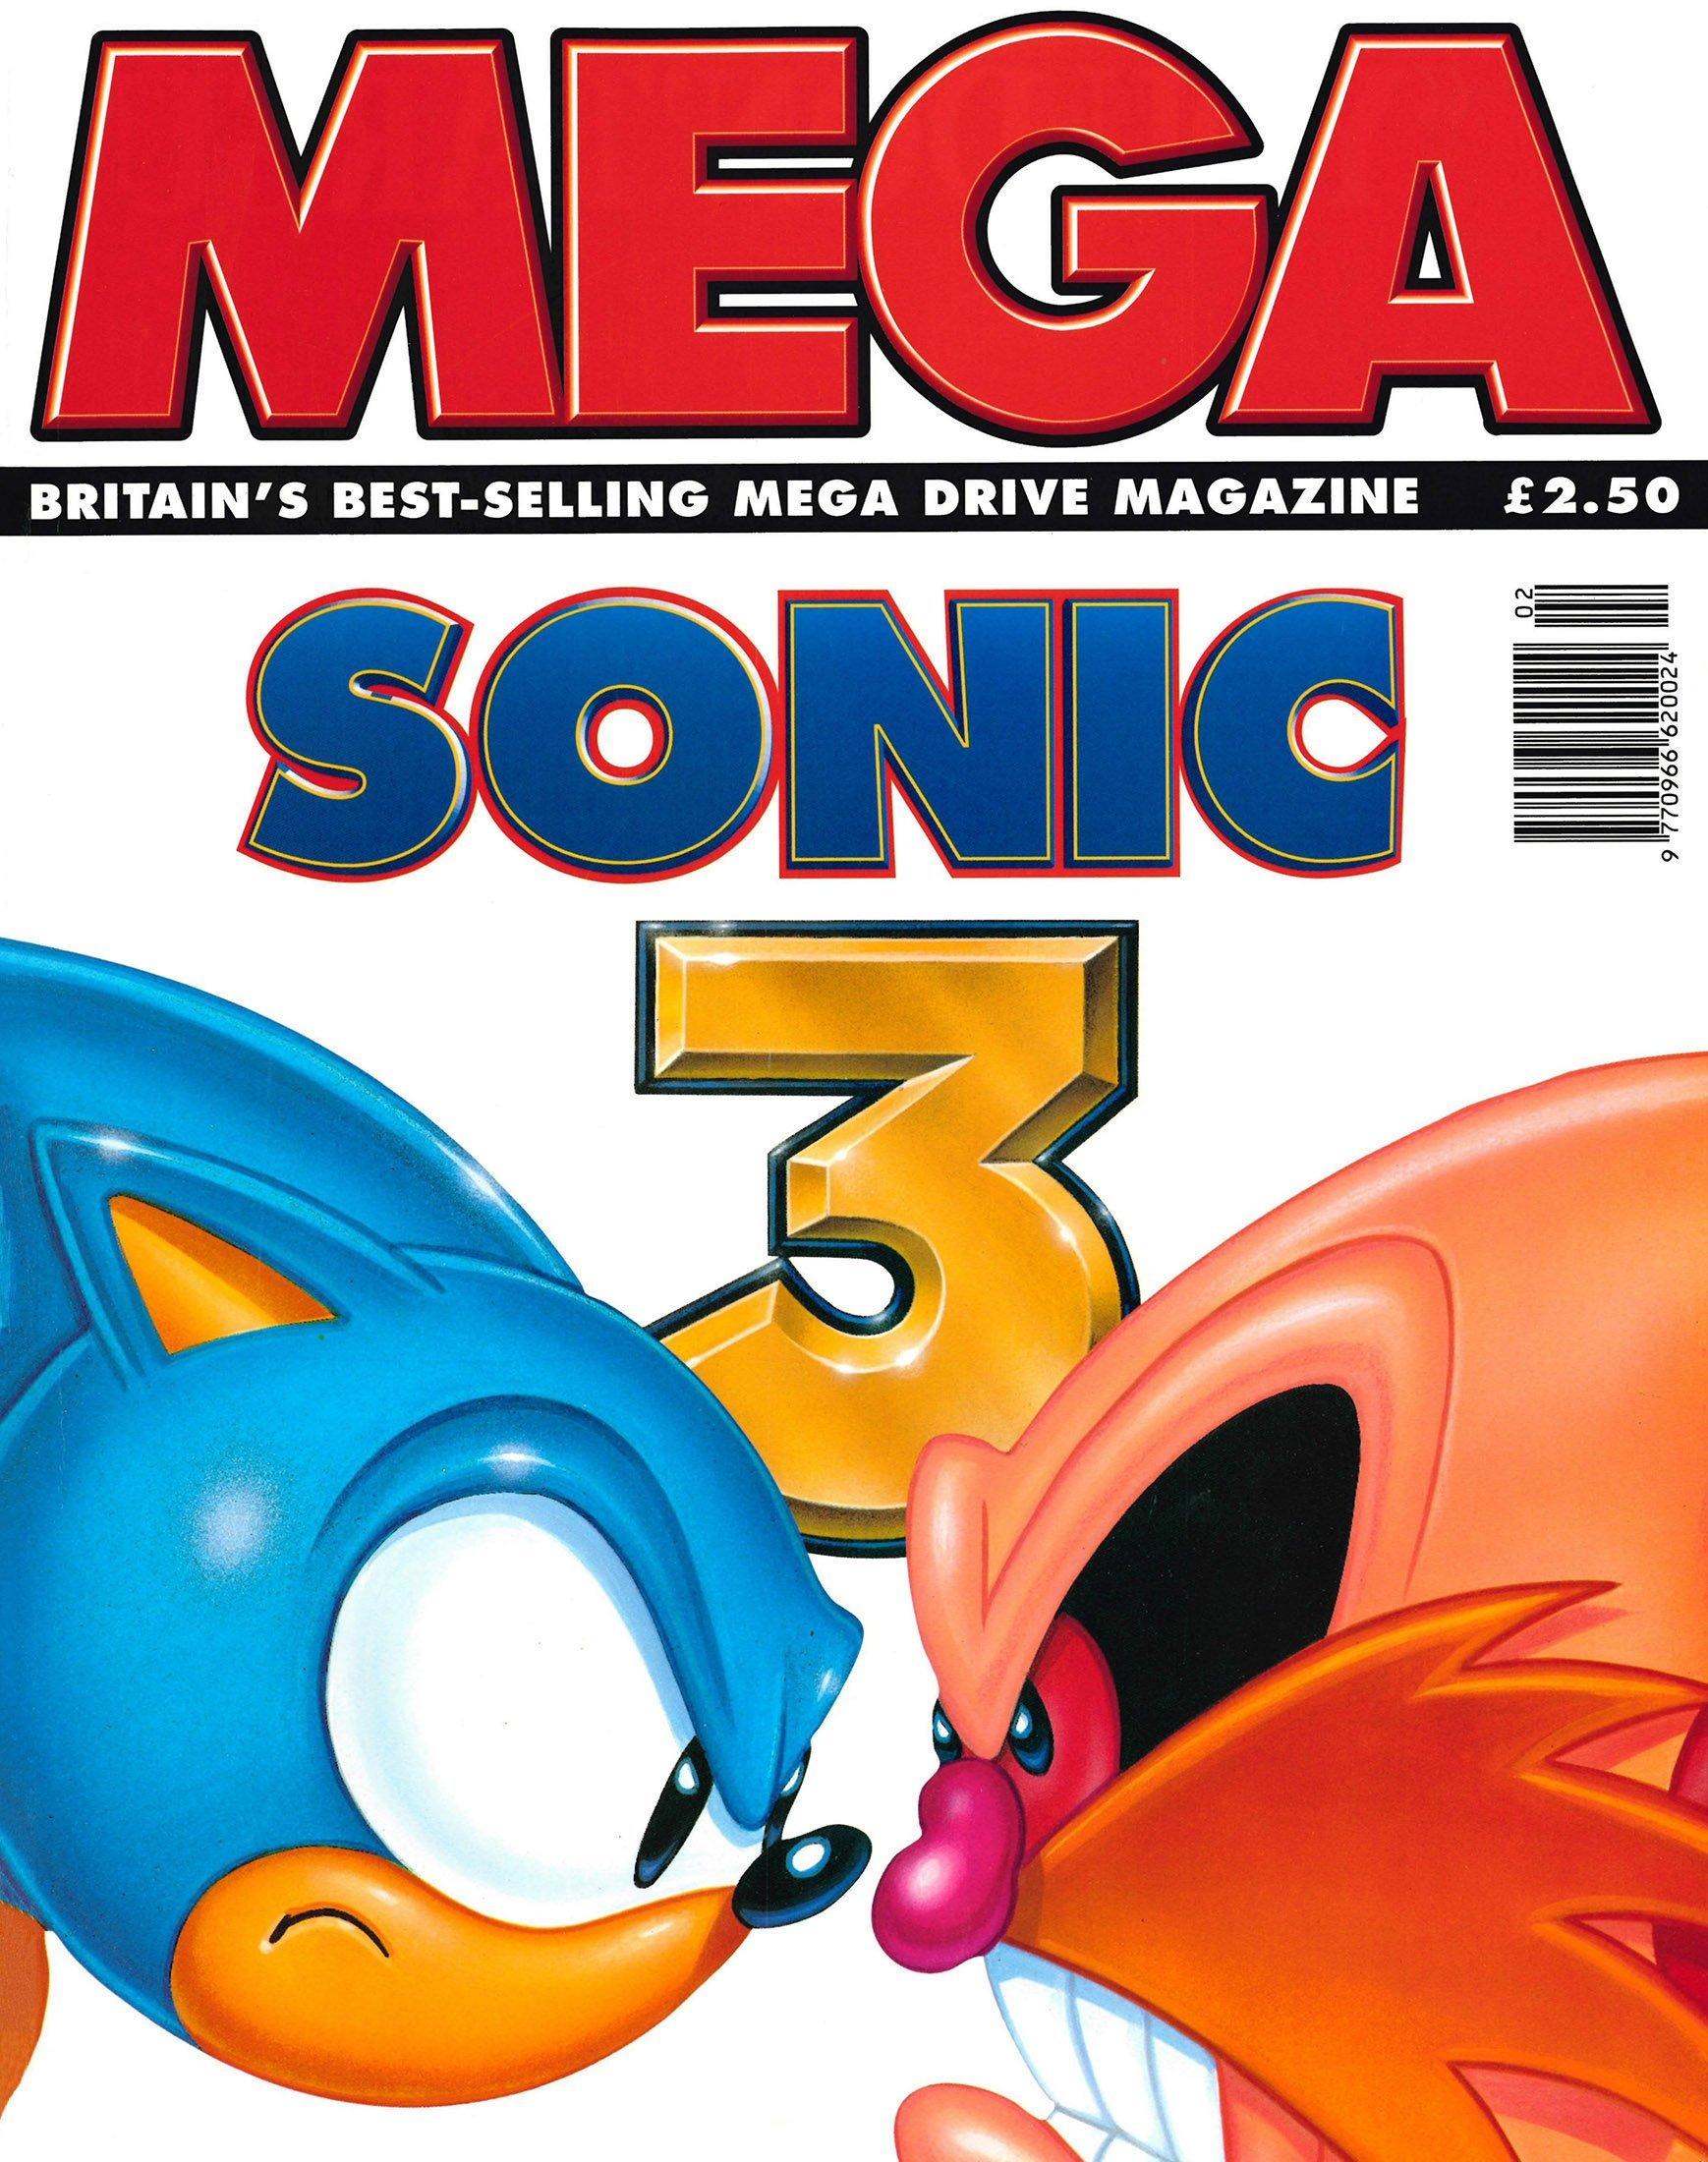 MEGA Issue 17 (February 1994)